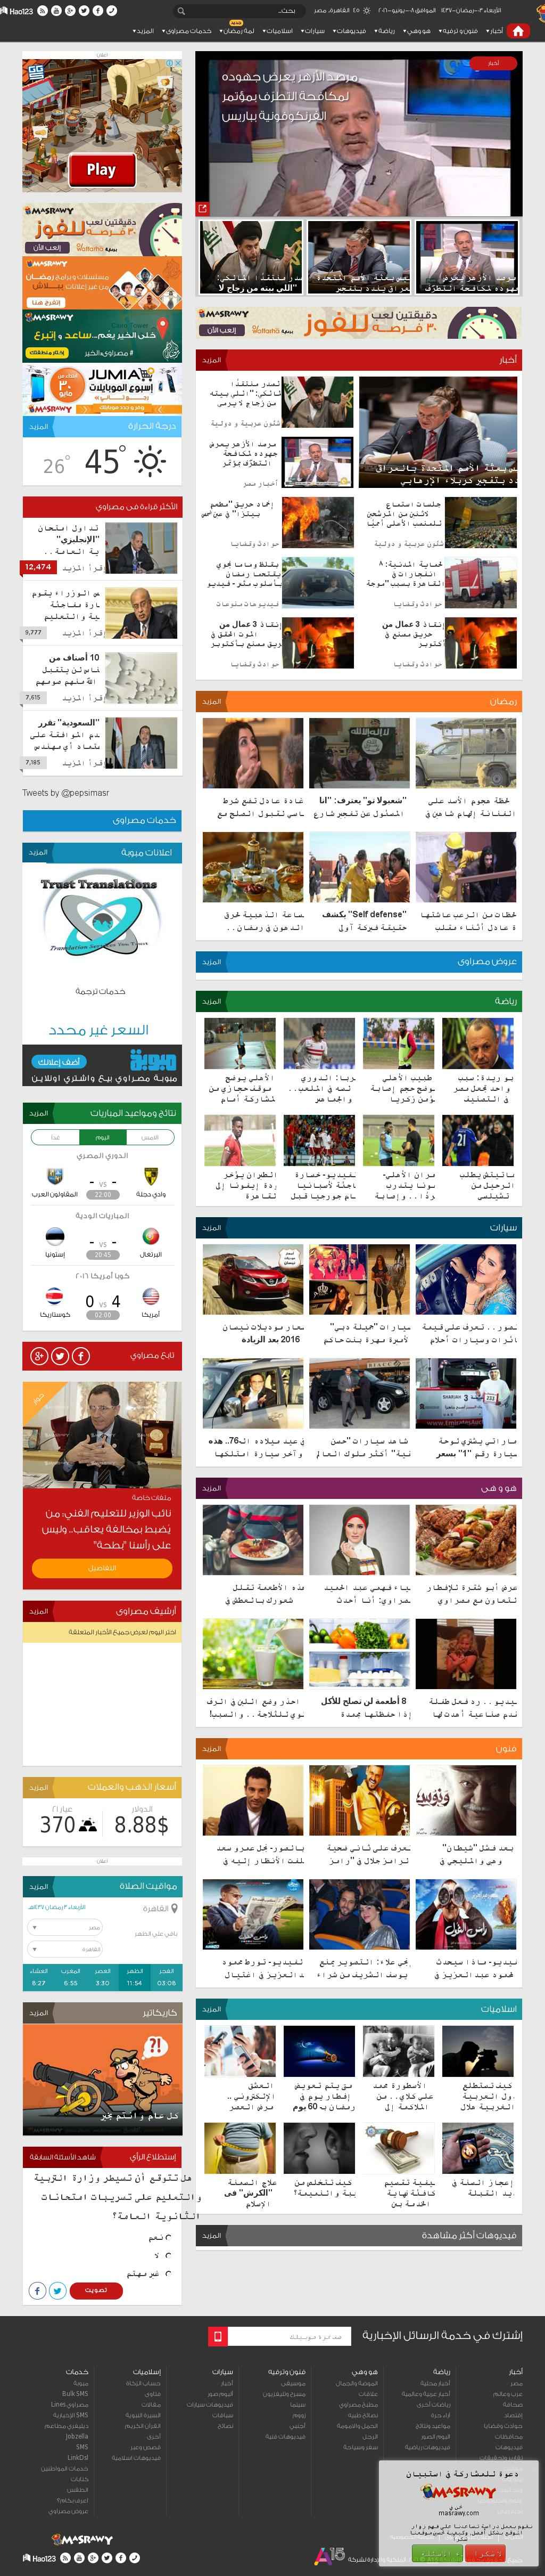 Masrawy at Wednesday June 8, 2016, 2:13 a.m. UTC